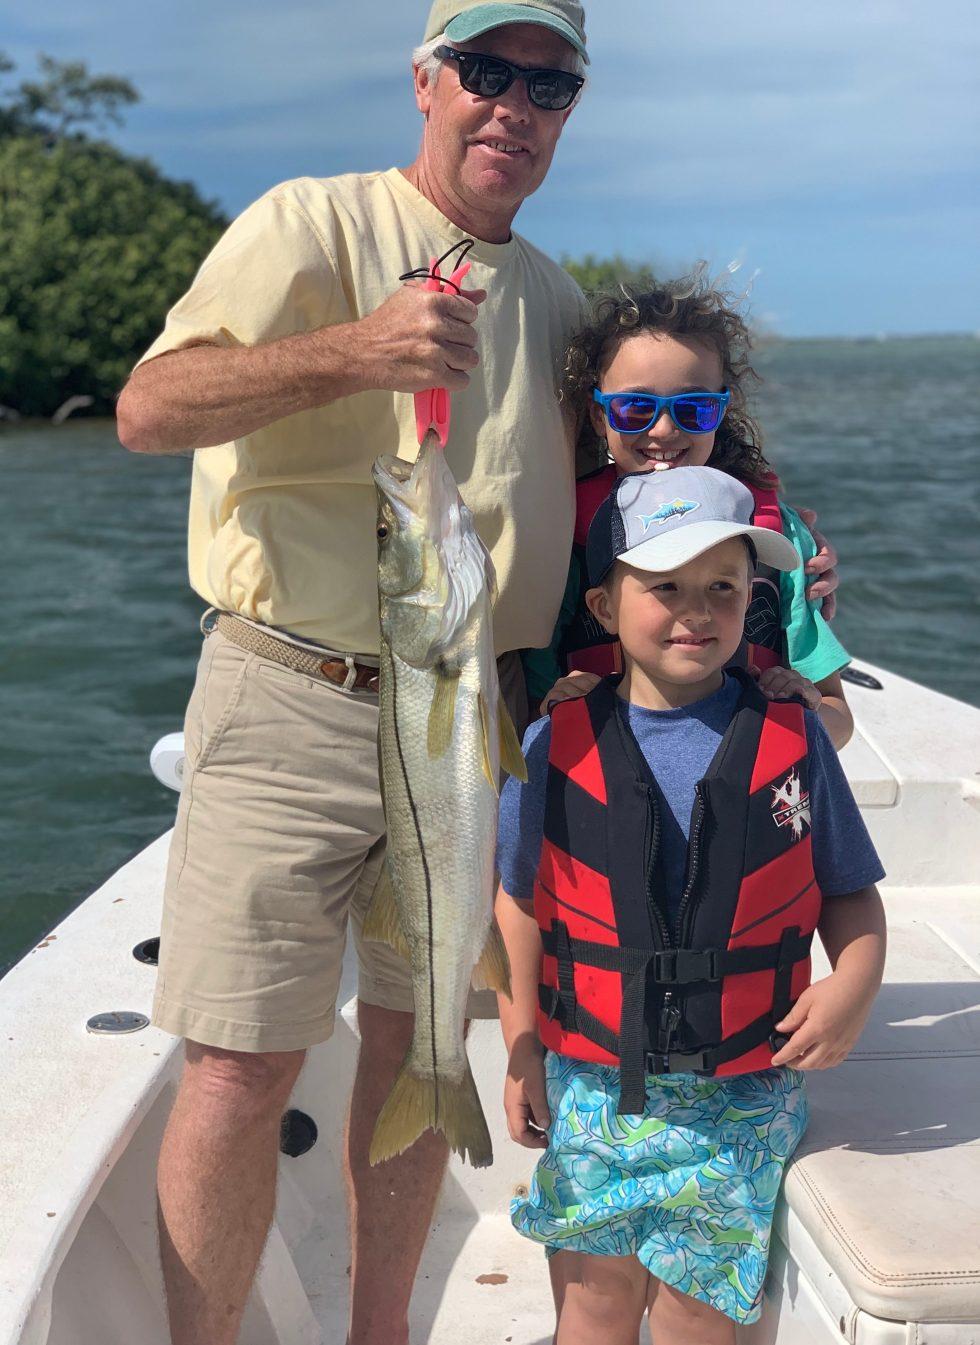 Snook, Sanibel Island Fishing, Catch & Release, Captiva Island, Monday, February 25, 2019.